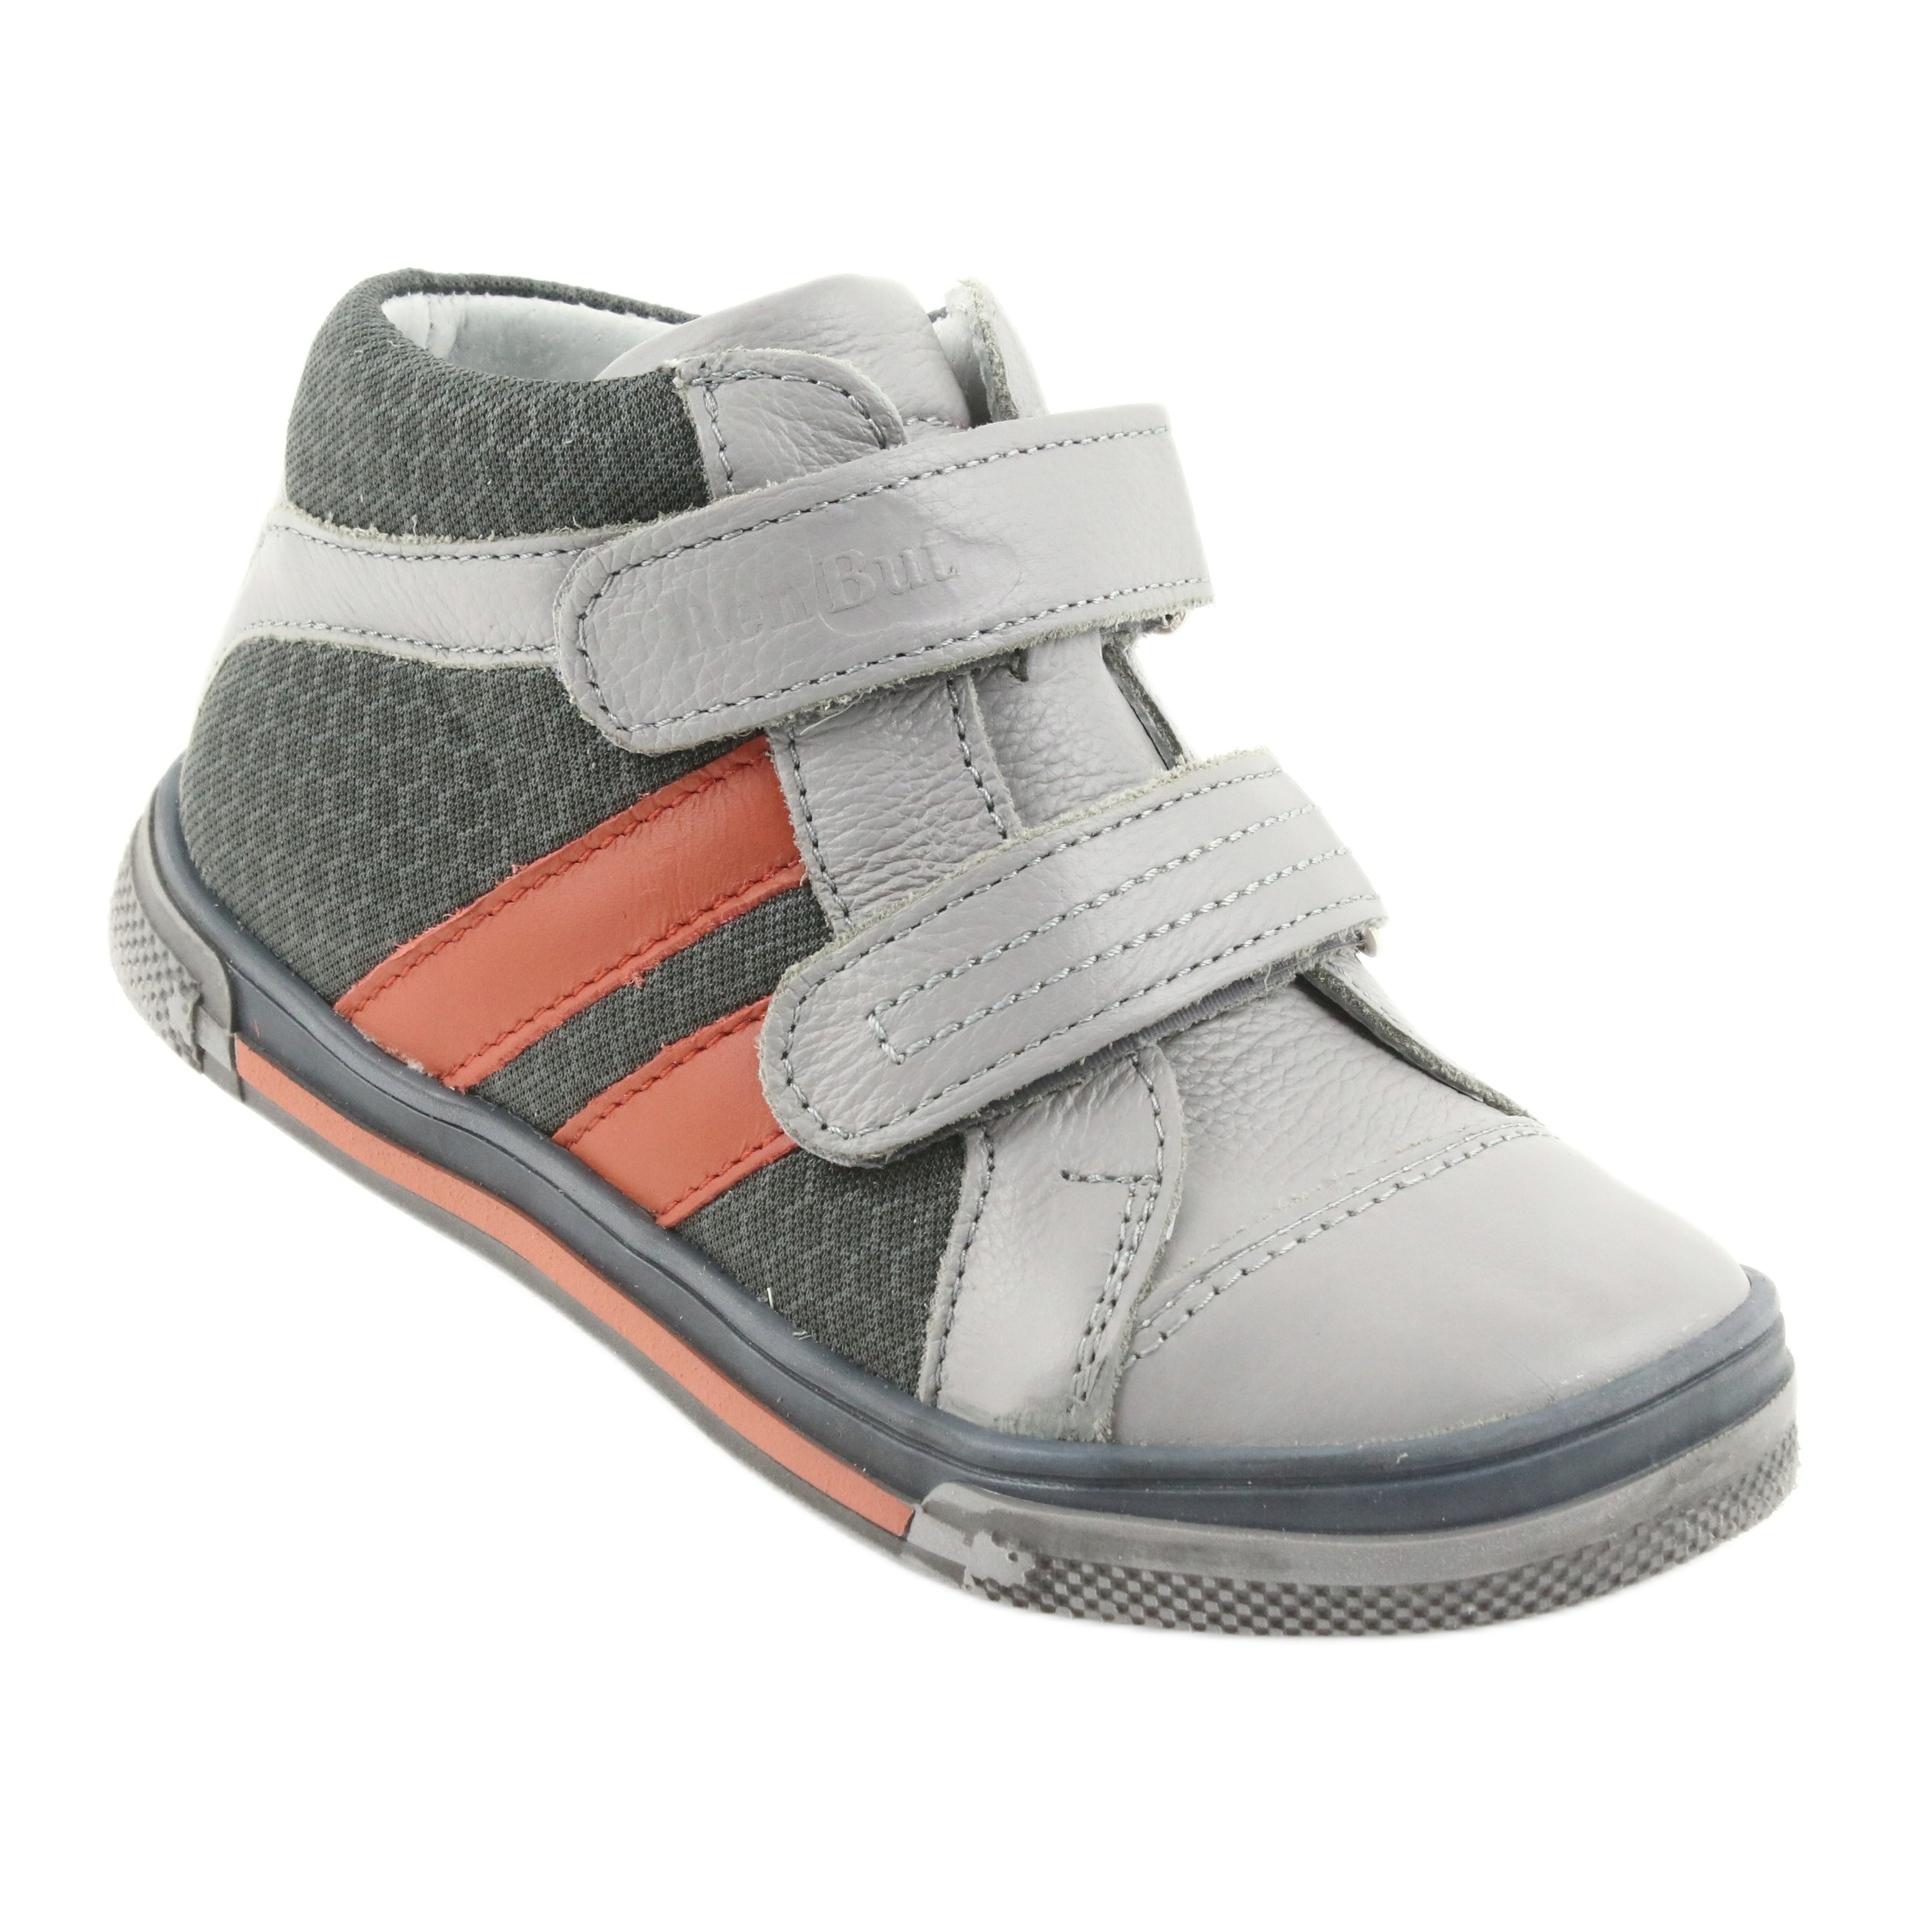 32a44b42b Ren But Boote sko Velcro støvler Ren Men 3225 grå / orange